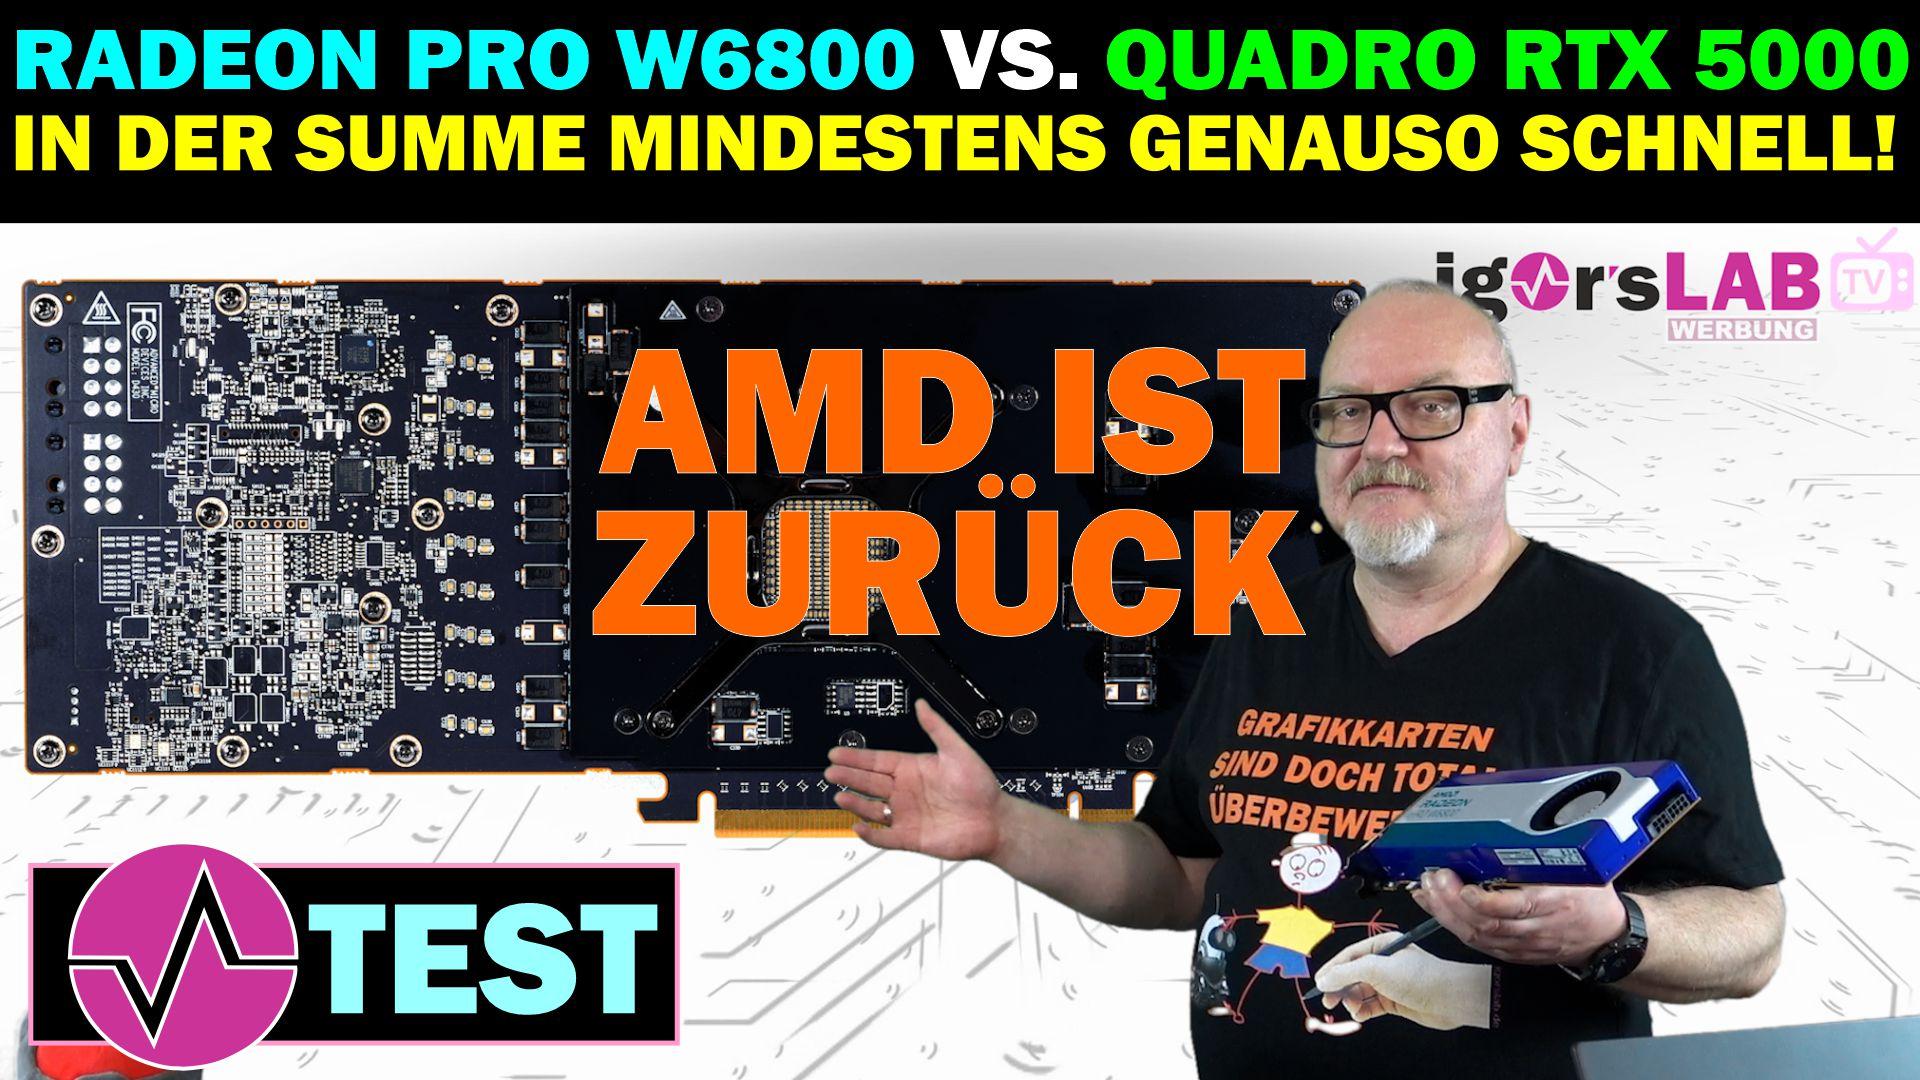 AMD Radeon Pro W6800 Review - AMD ärgert NVIDIA und meldet